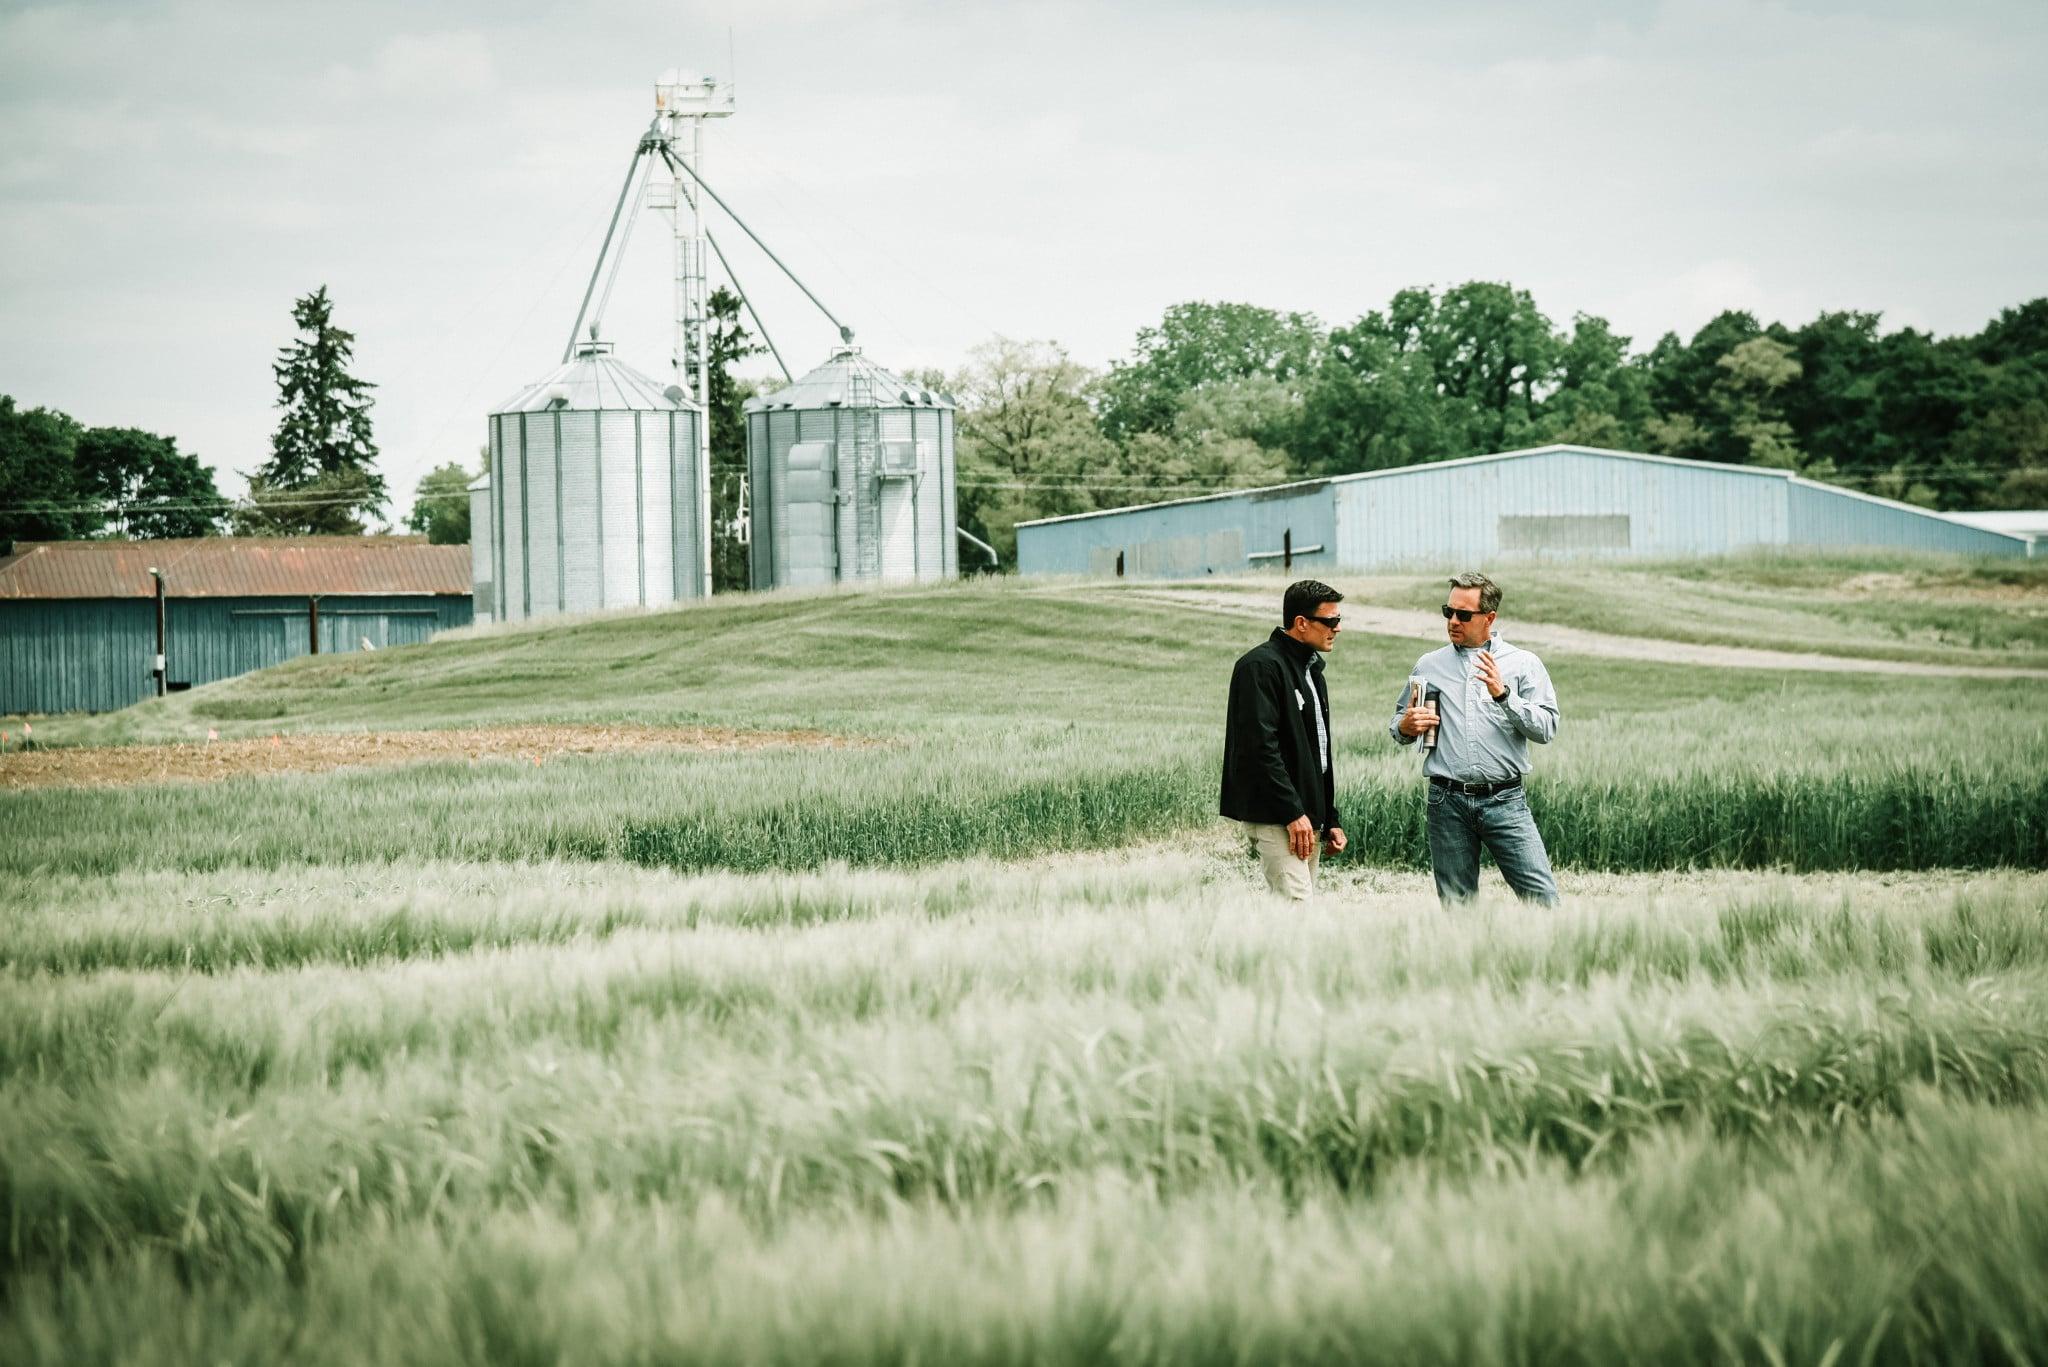 two people standing in a grain field